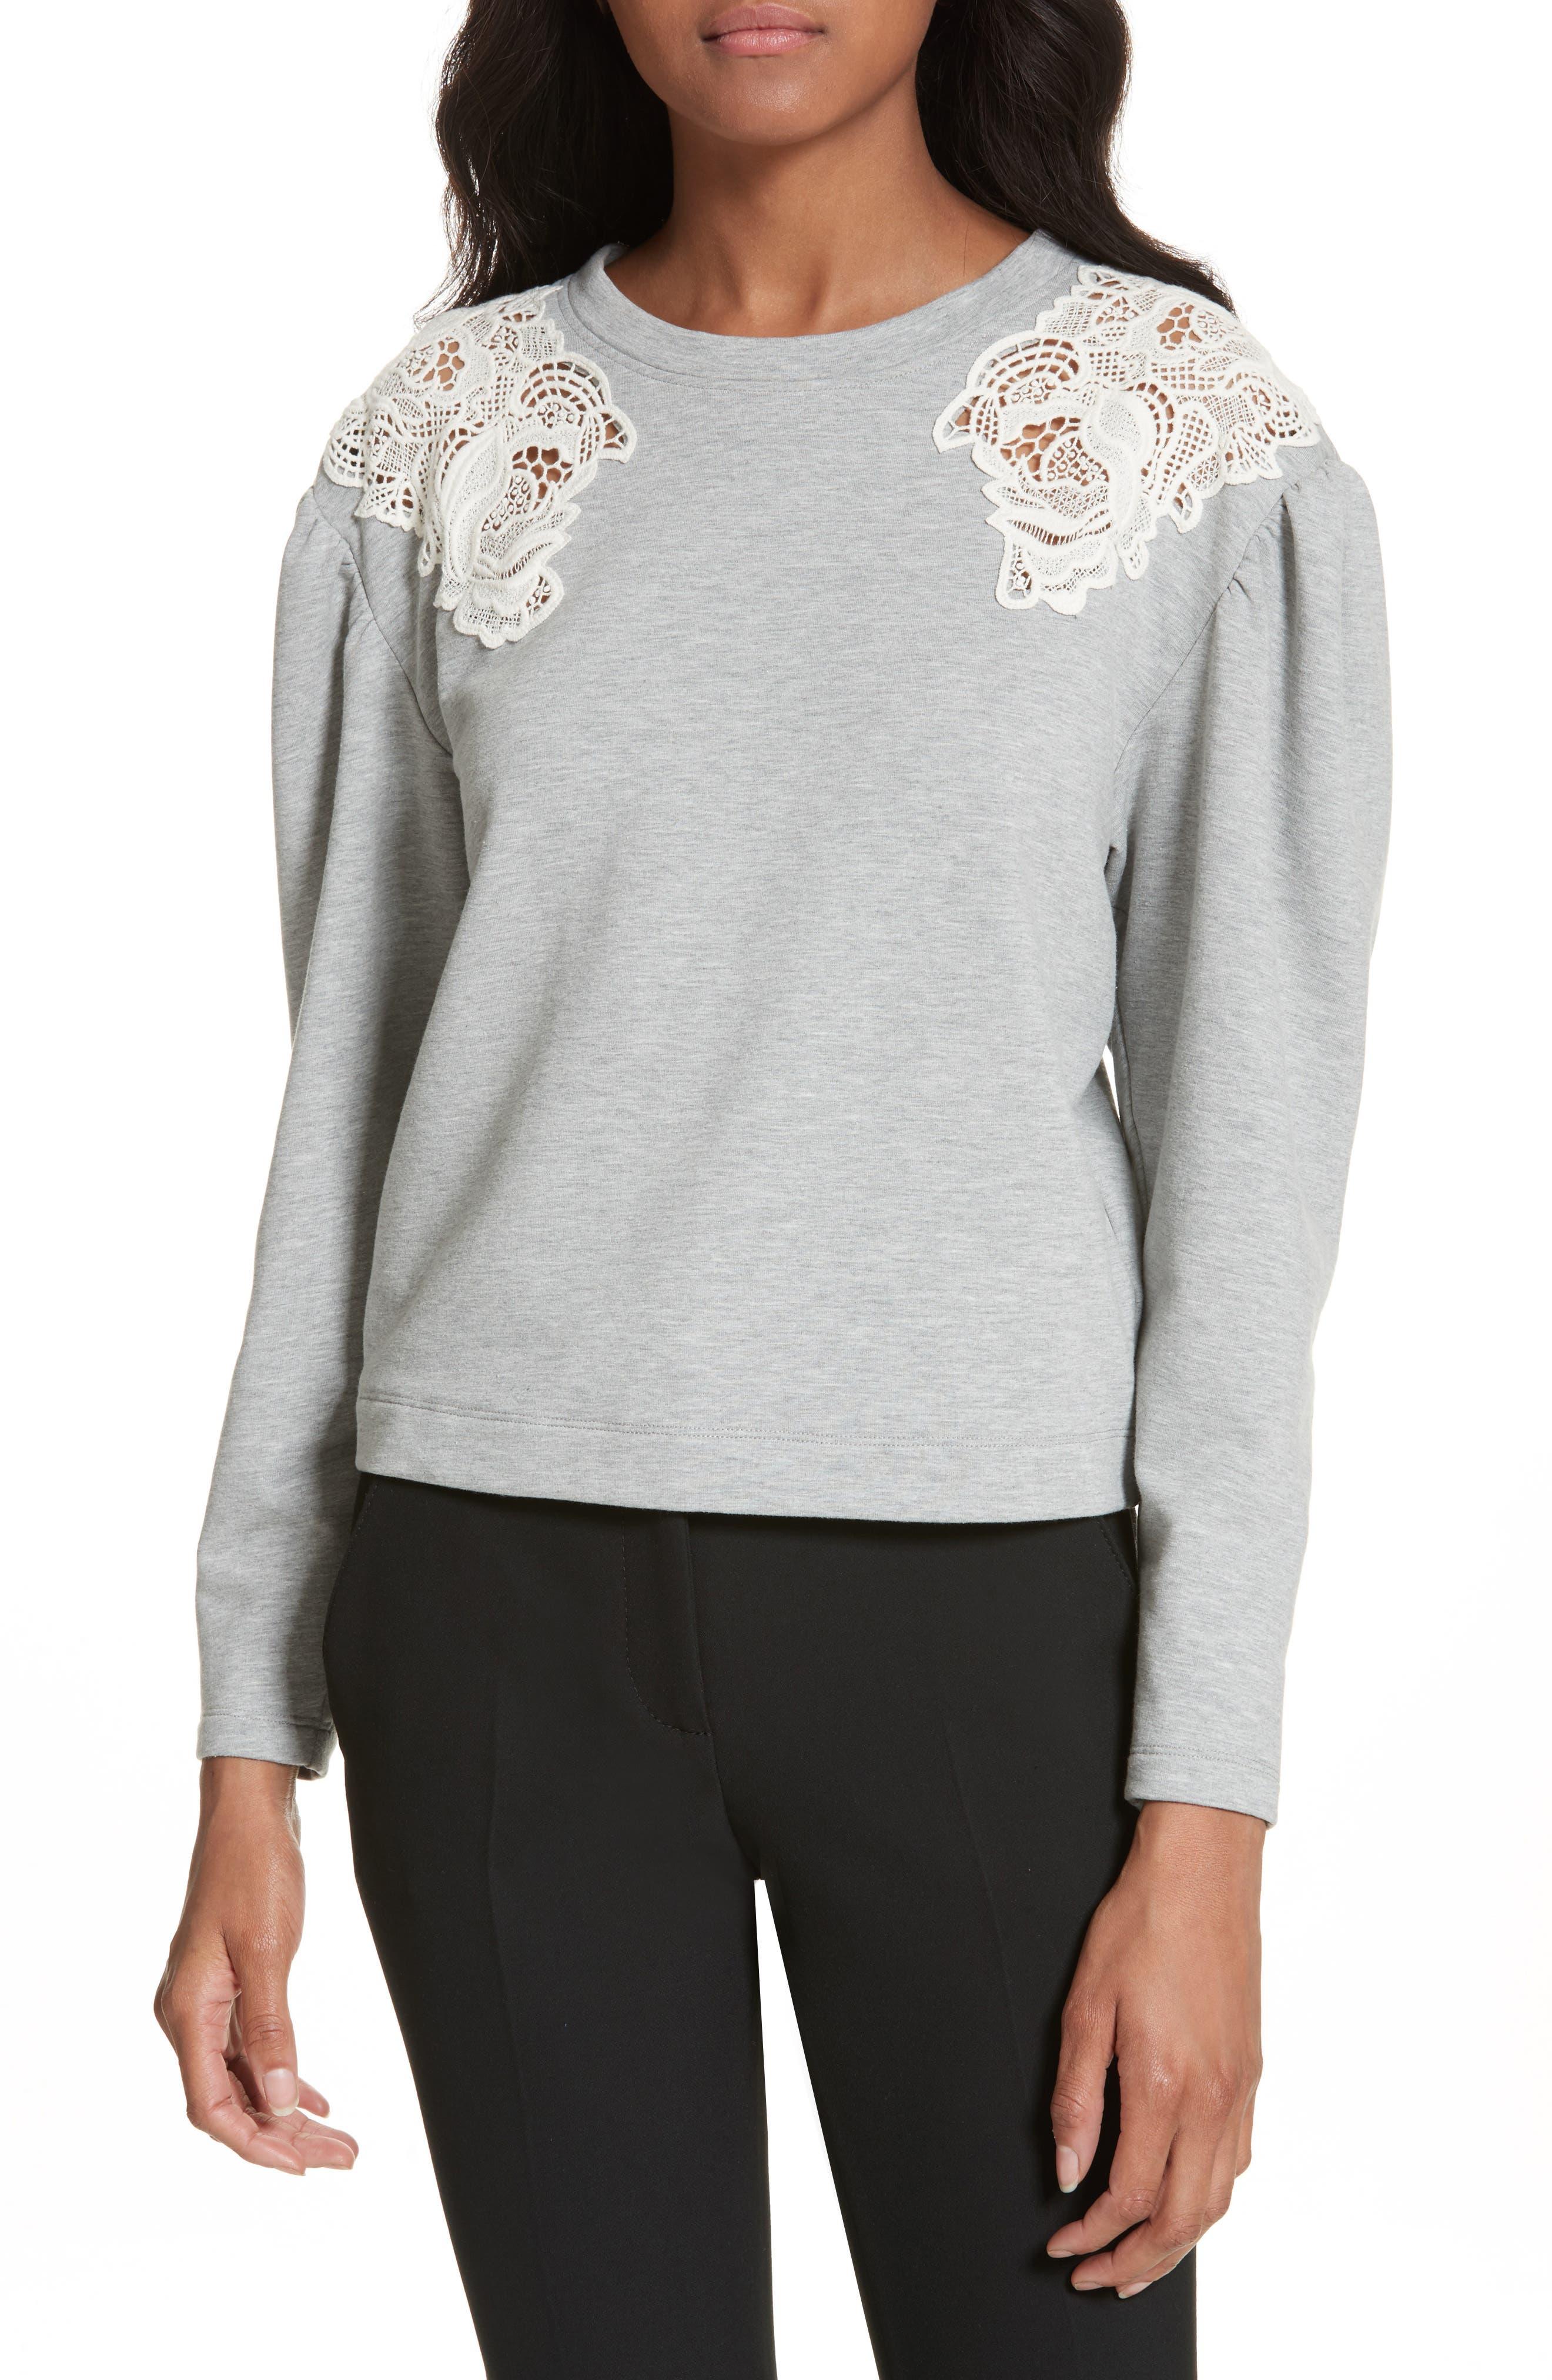 Main Image - Rebecca Taylor Lace Inset Sweatshirt